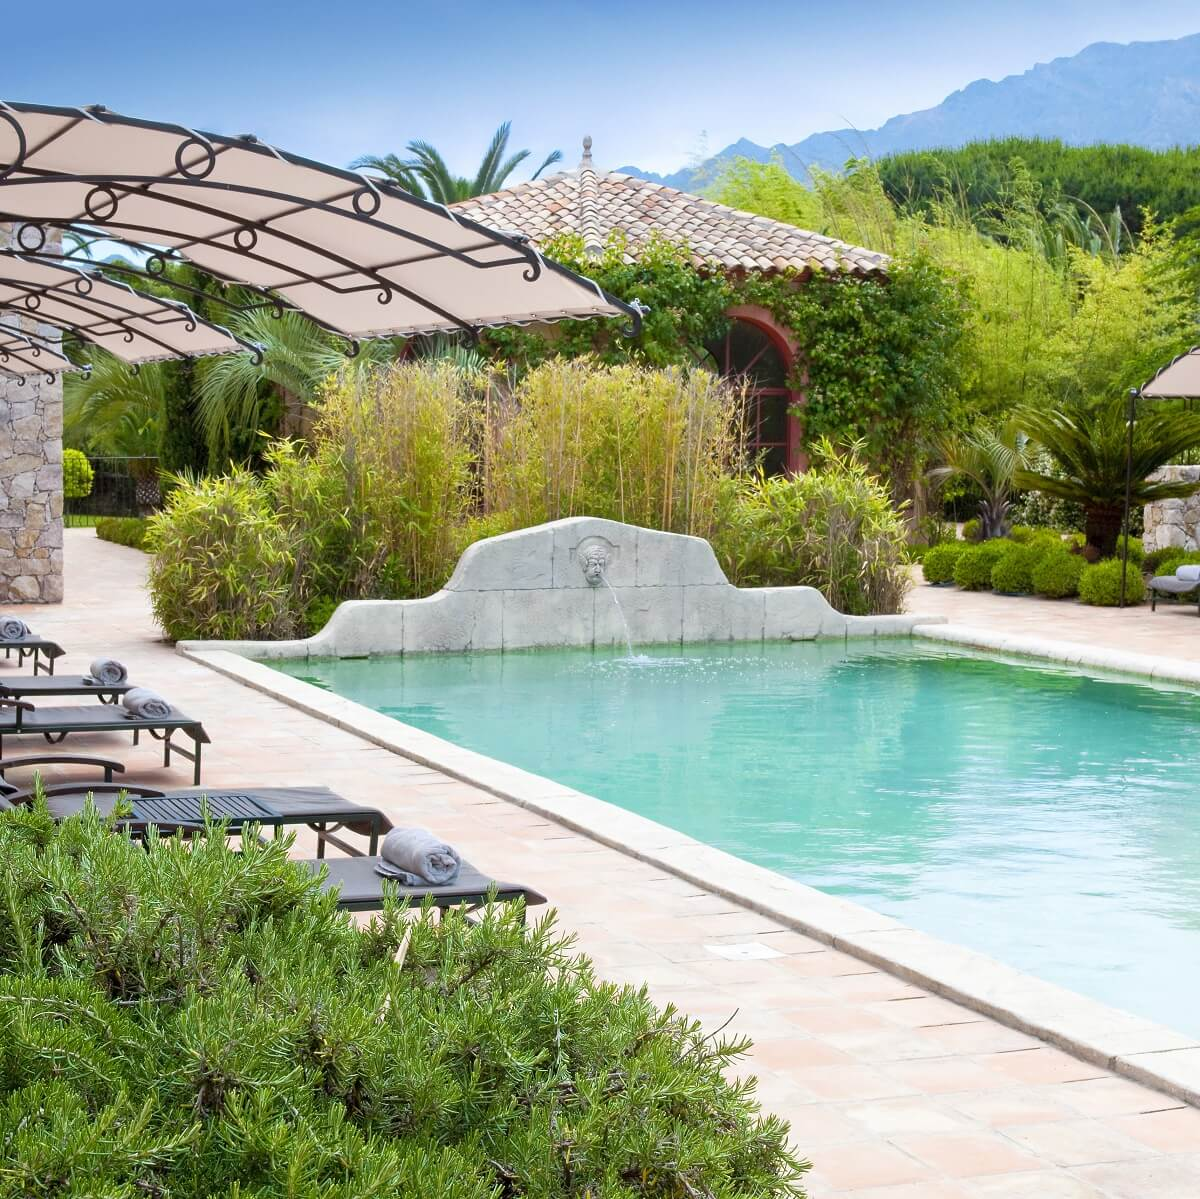 Piscine extérieure - Hôtel La Signoria - Calvi - Corse du sud